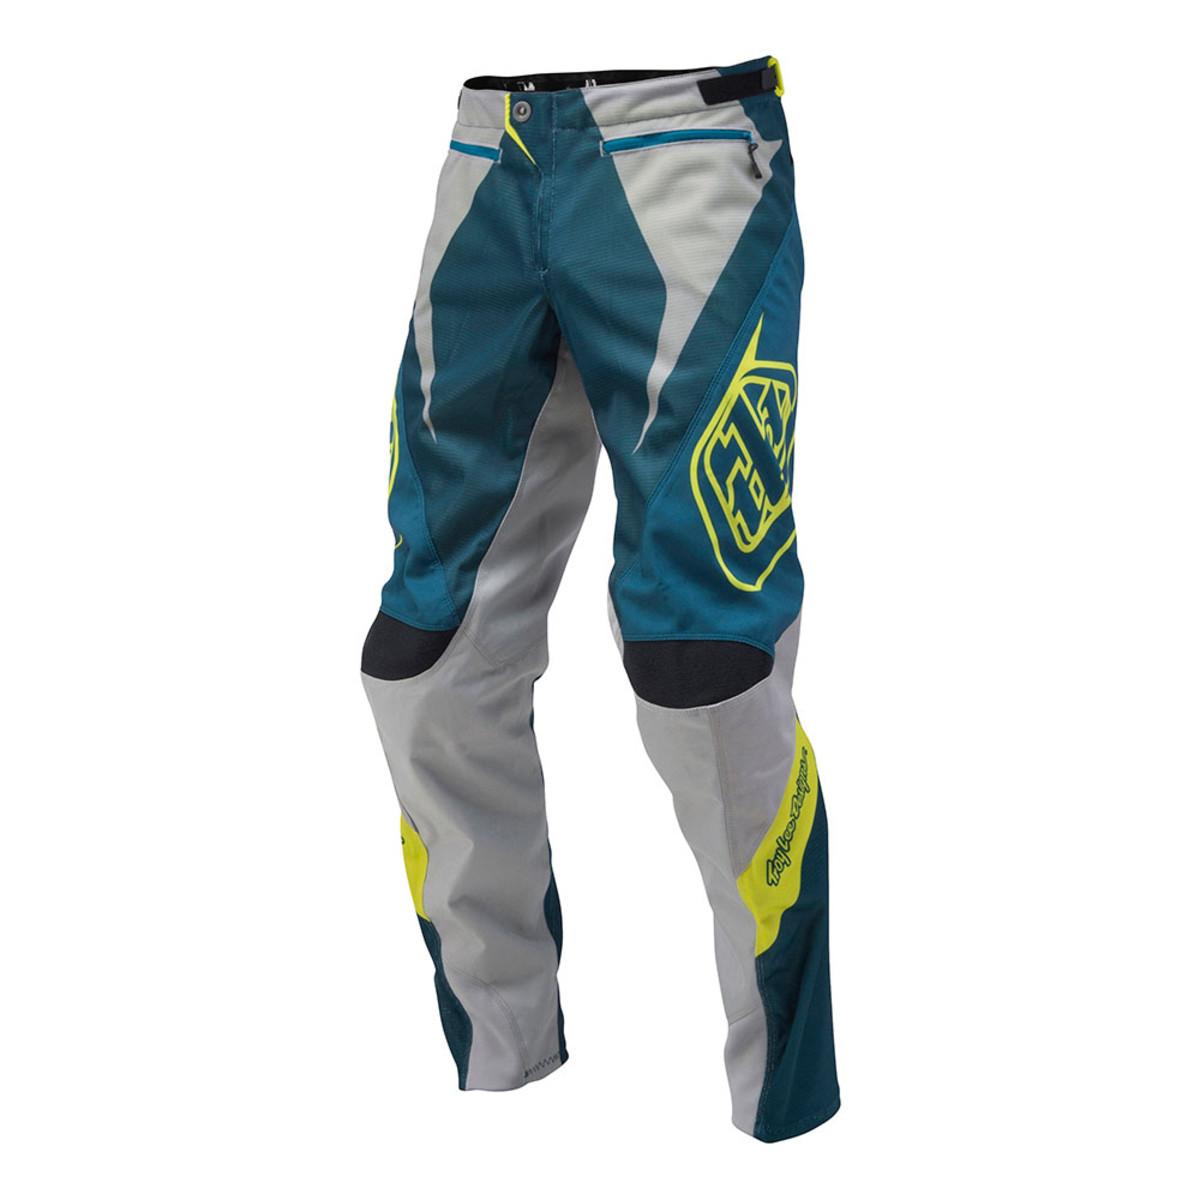 38306869b 2016 Troy Lee Designs Sprint Reflex Pant Dirty Blue